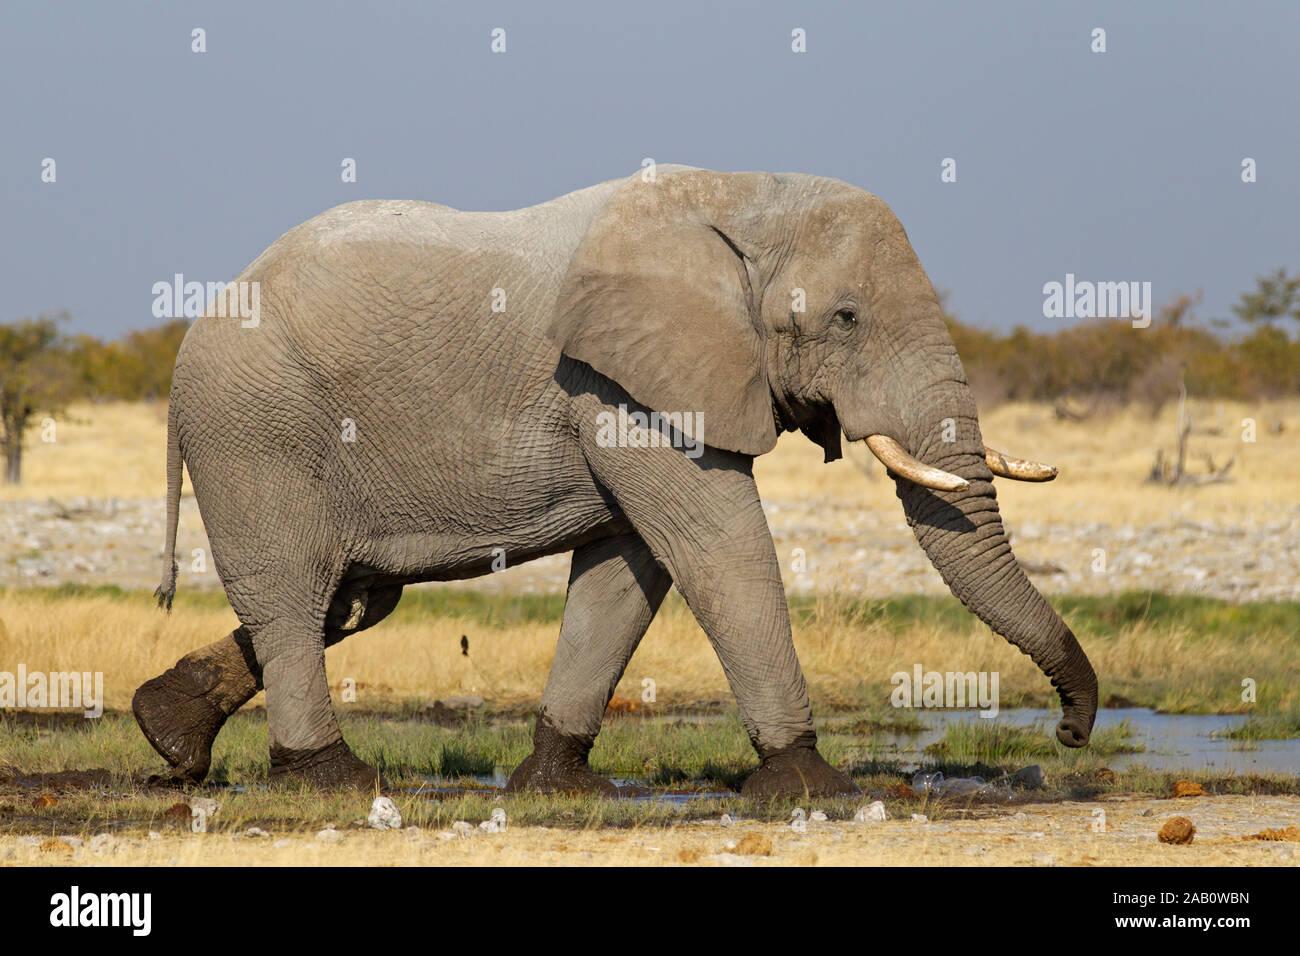 Afrikanischer Elefant am Wasserloch, Loxodonta africana, Stock Photo